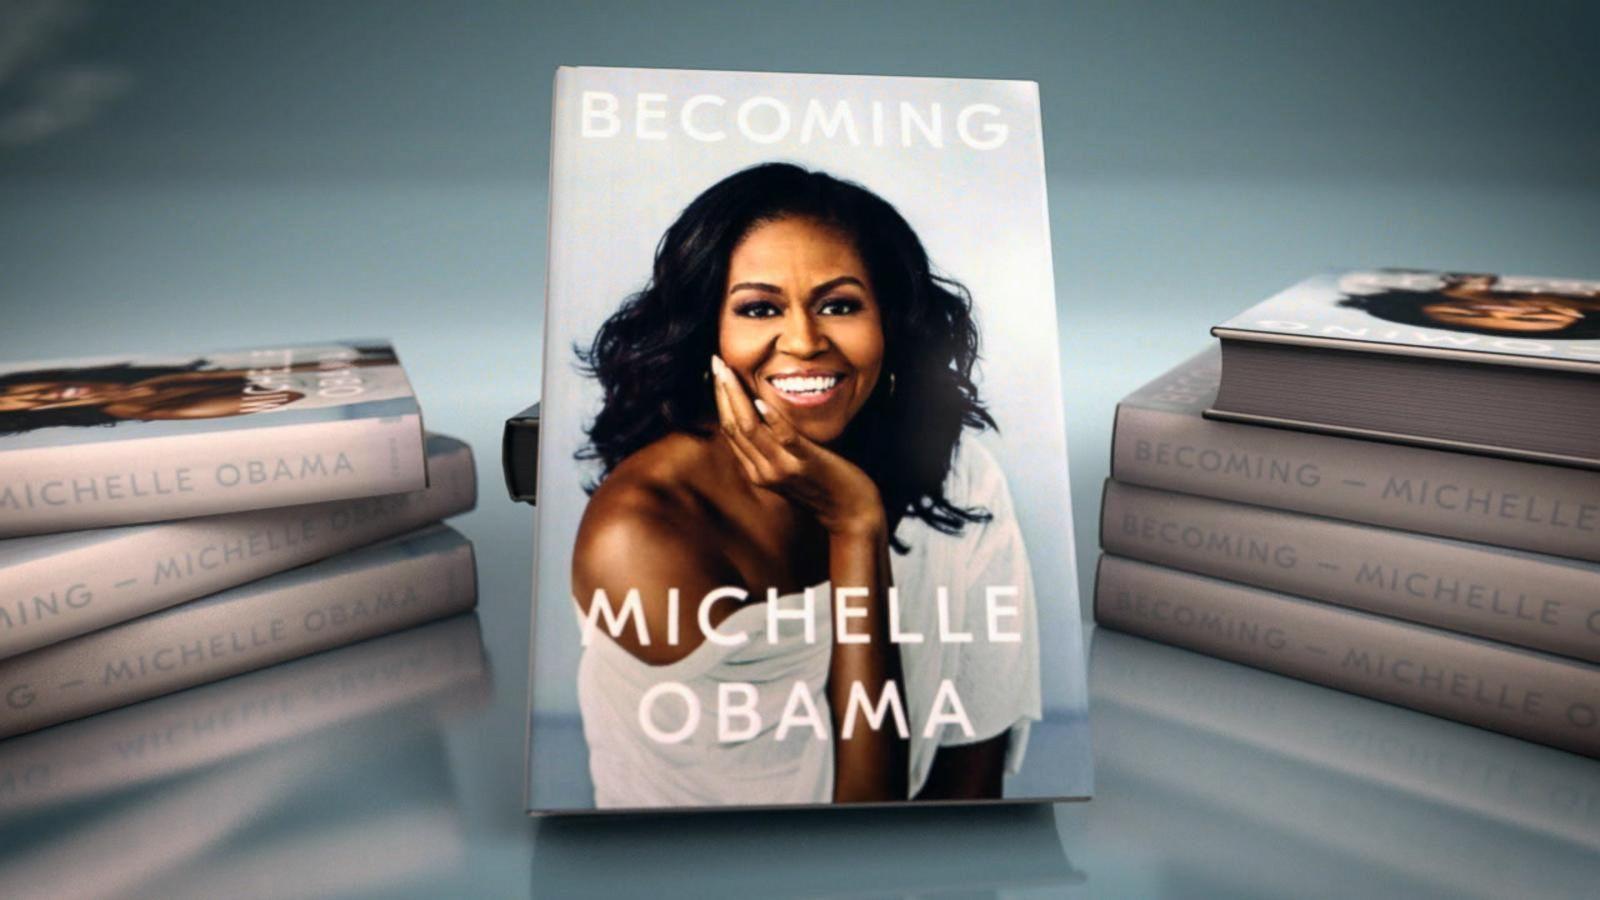 Мішель Обама книжка Becoming